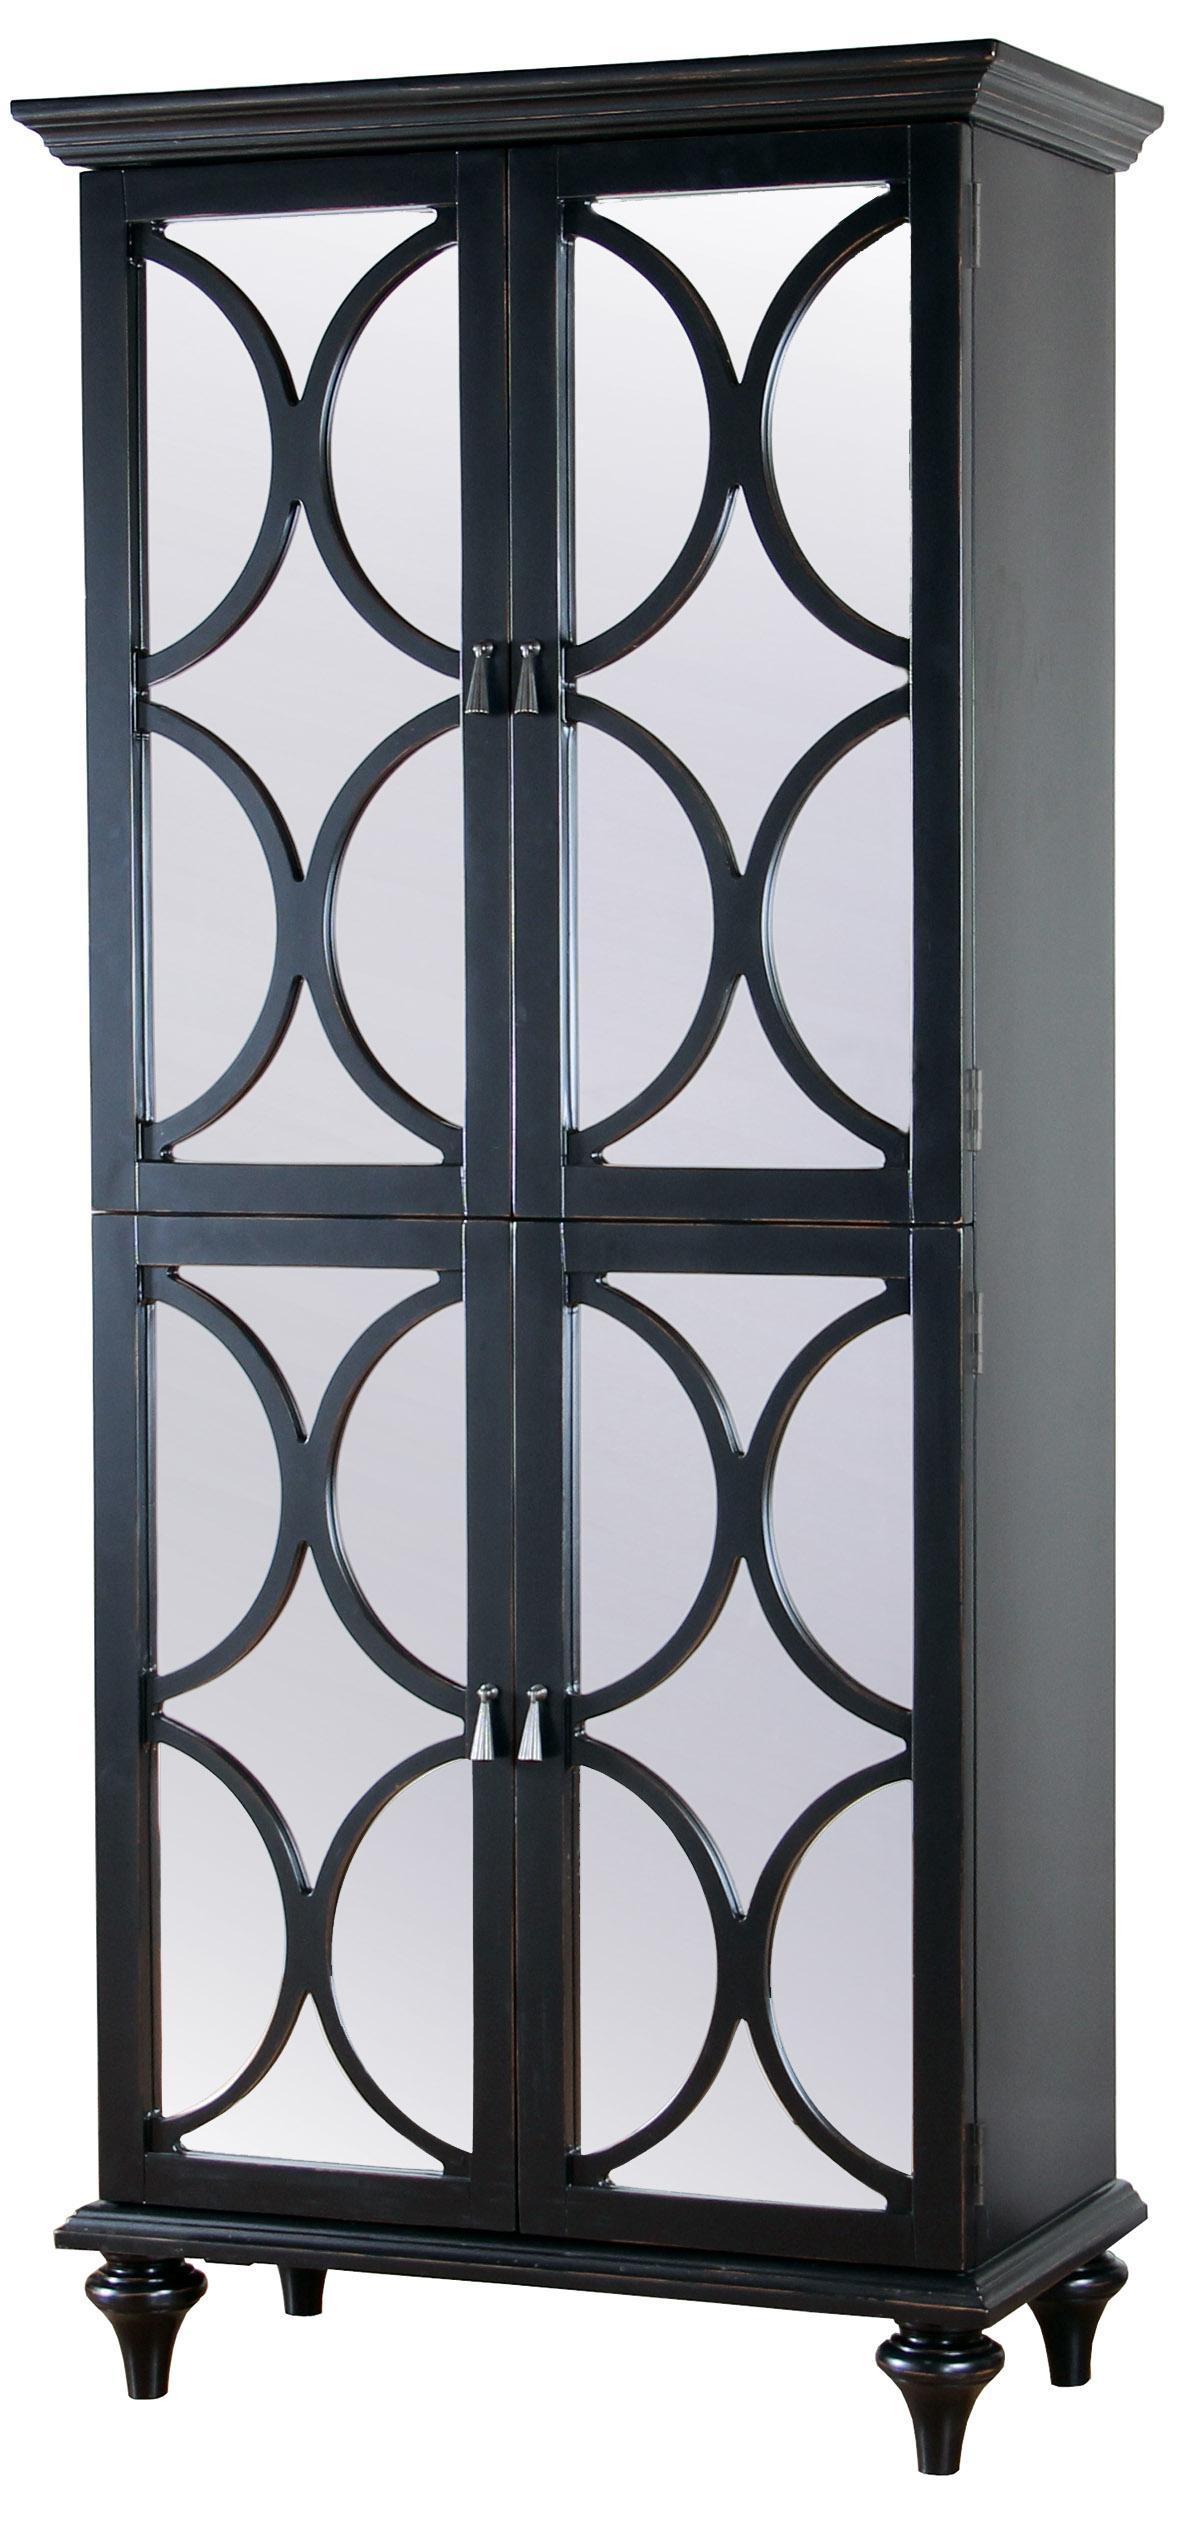 Pulaski Furniture Accents Wine Cabinet - Item Number: 549237